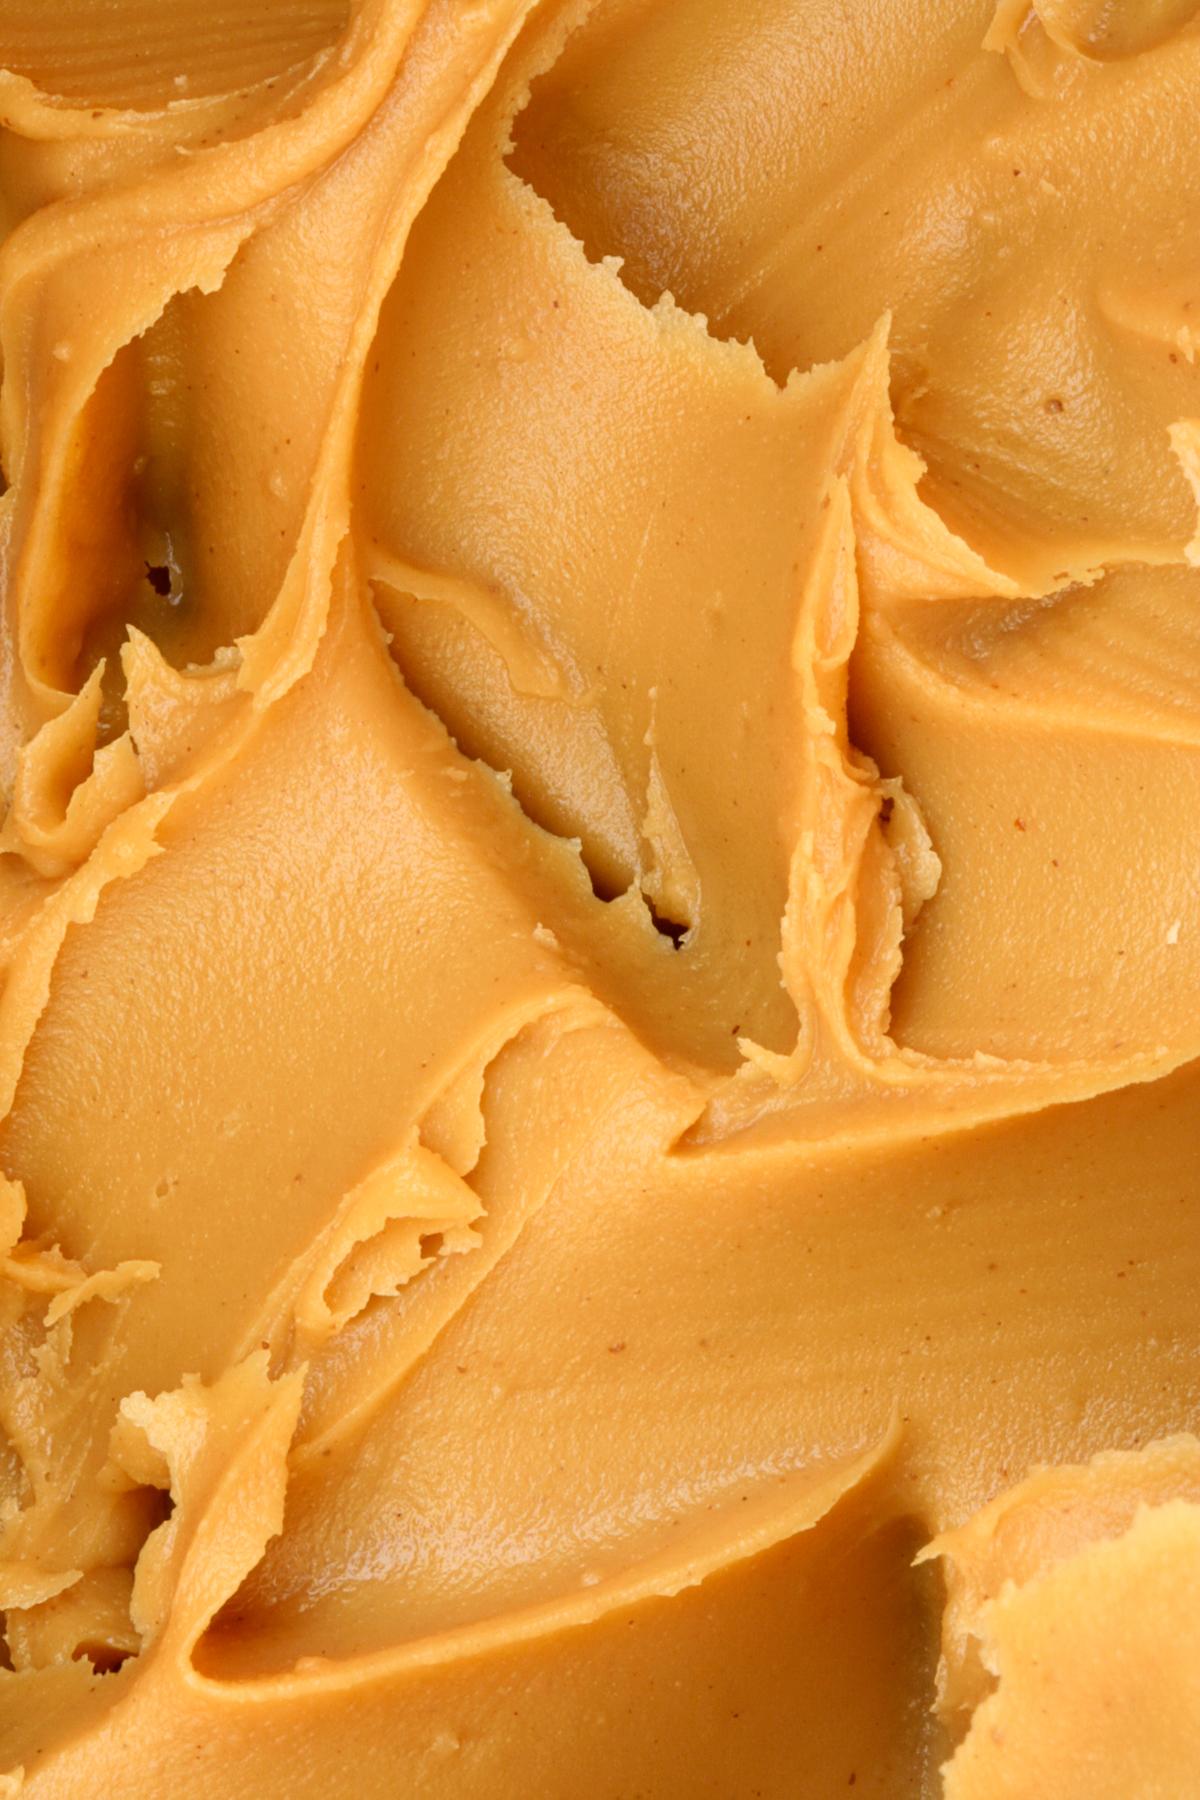 stockvault-peanut-butter-texture133218